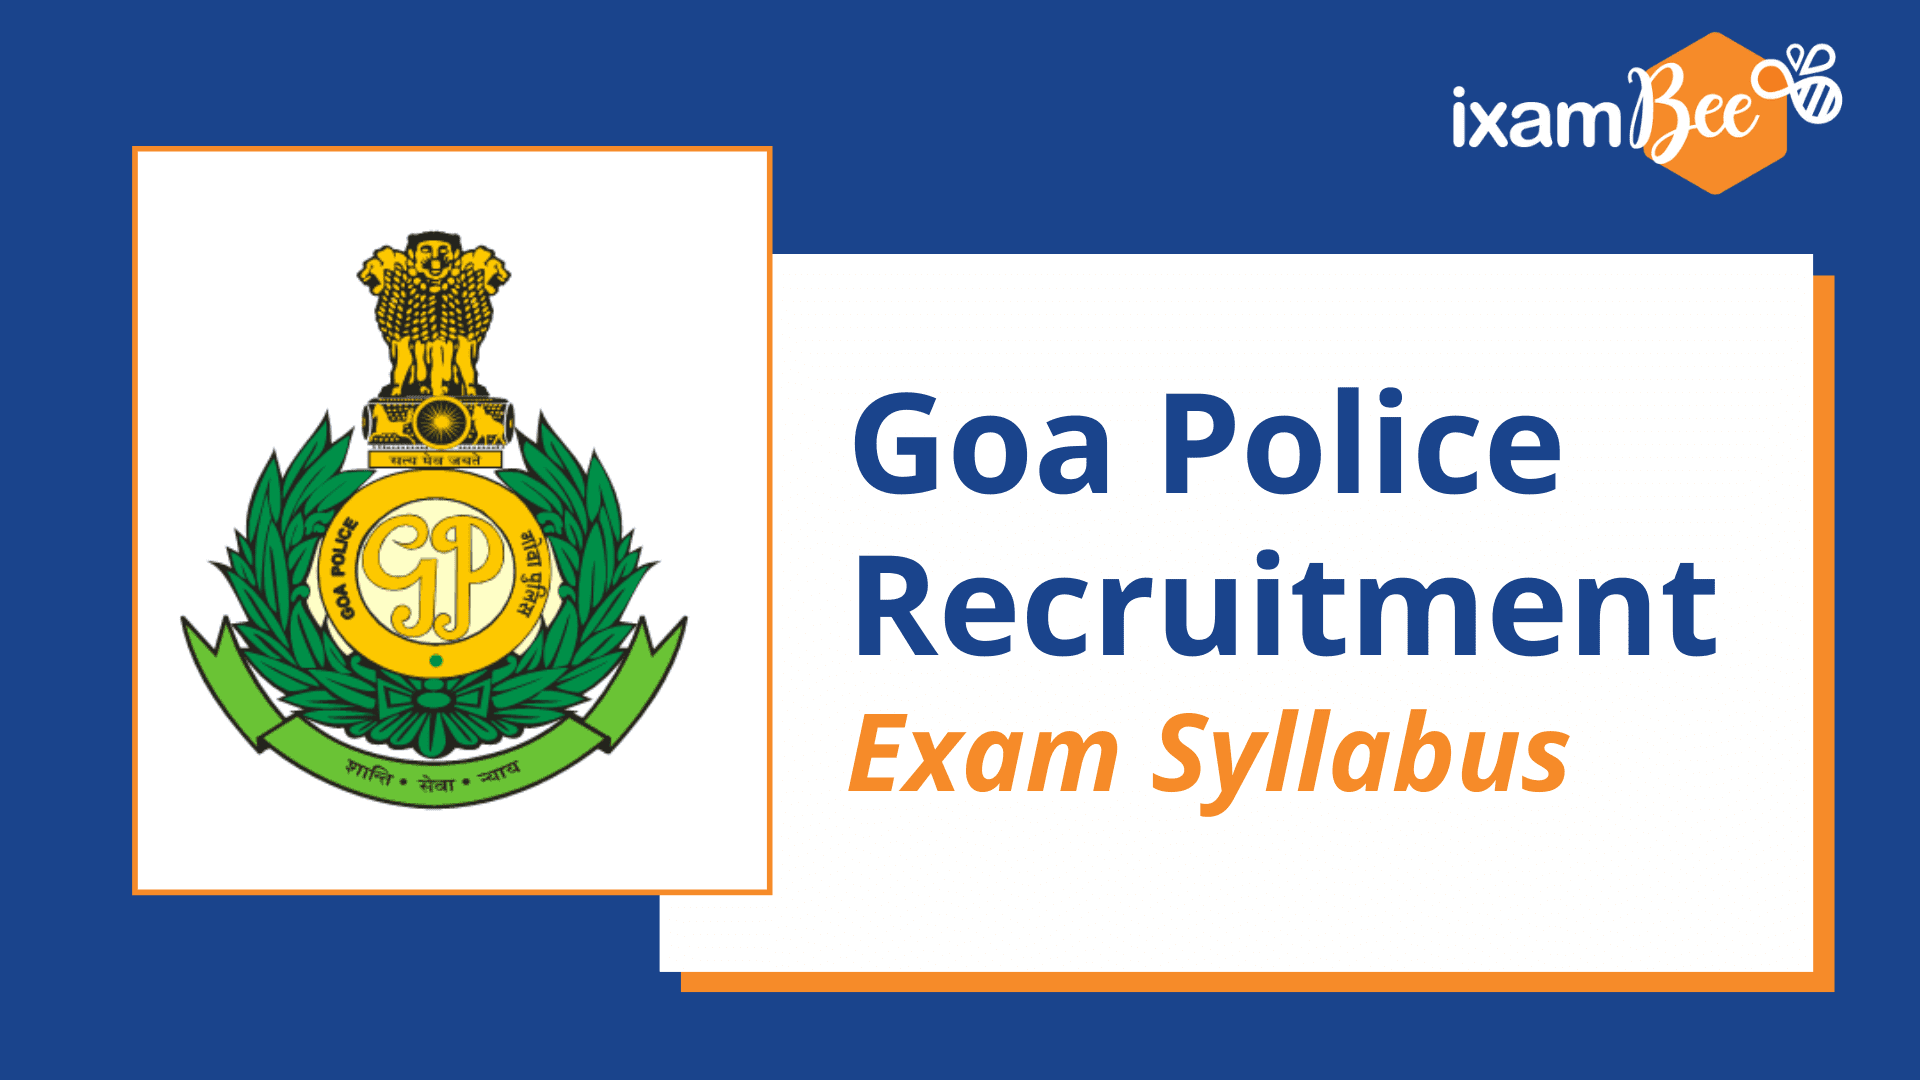 Goa Police Recruitment Syllabus